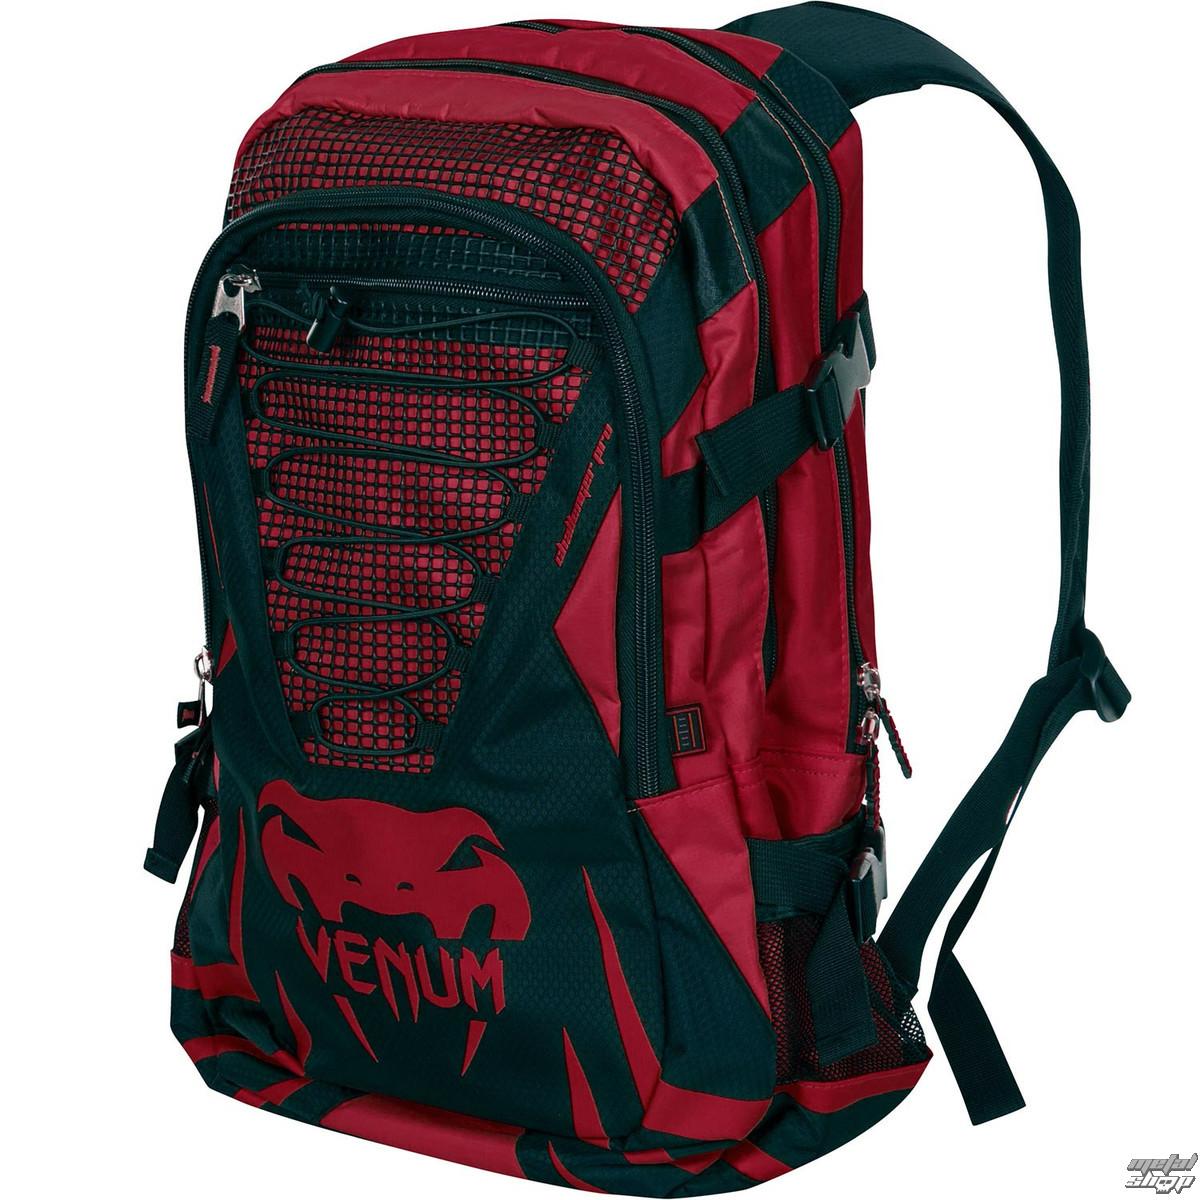 batoh Venum - Challenger - Red - EU-&&string2&&-2122-RED